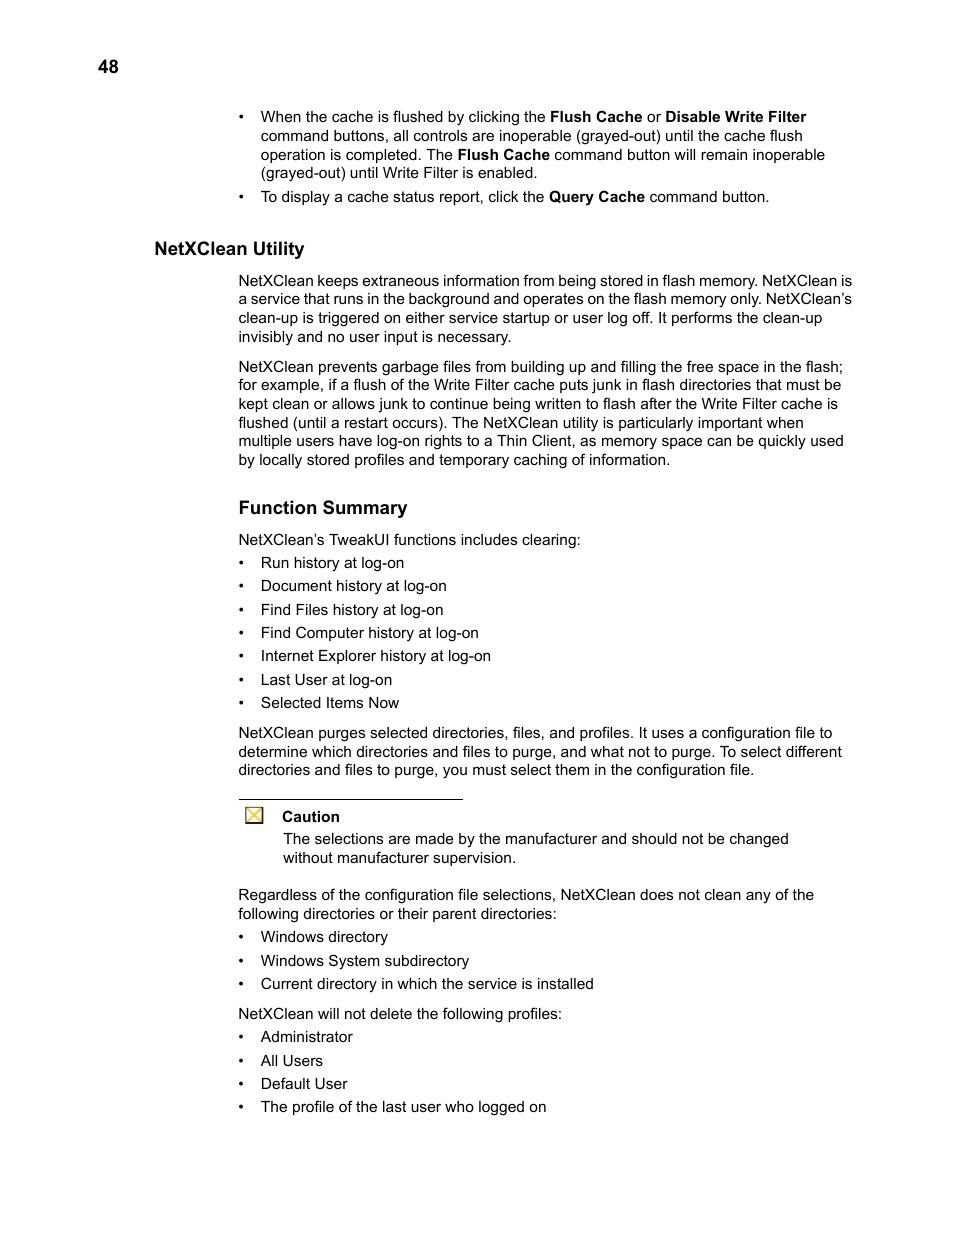 Netxclean utility, Function summary | Wyse Technology TM